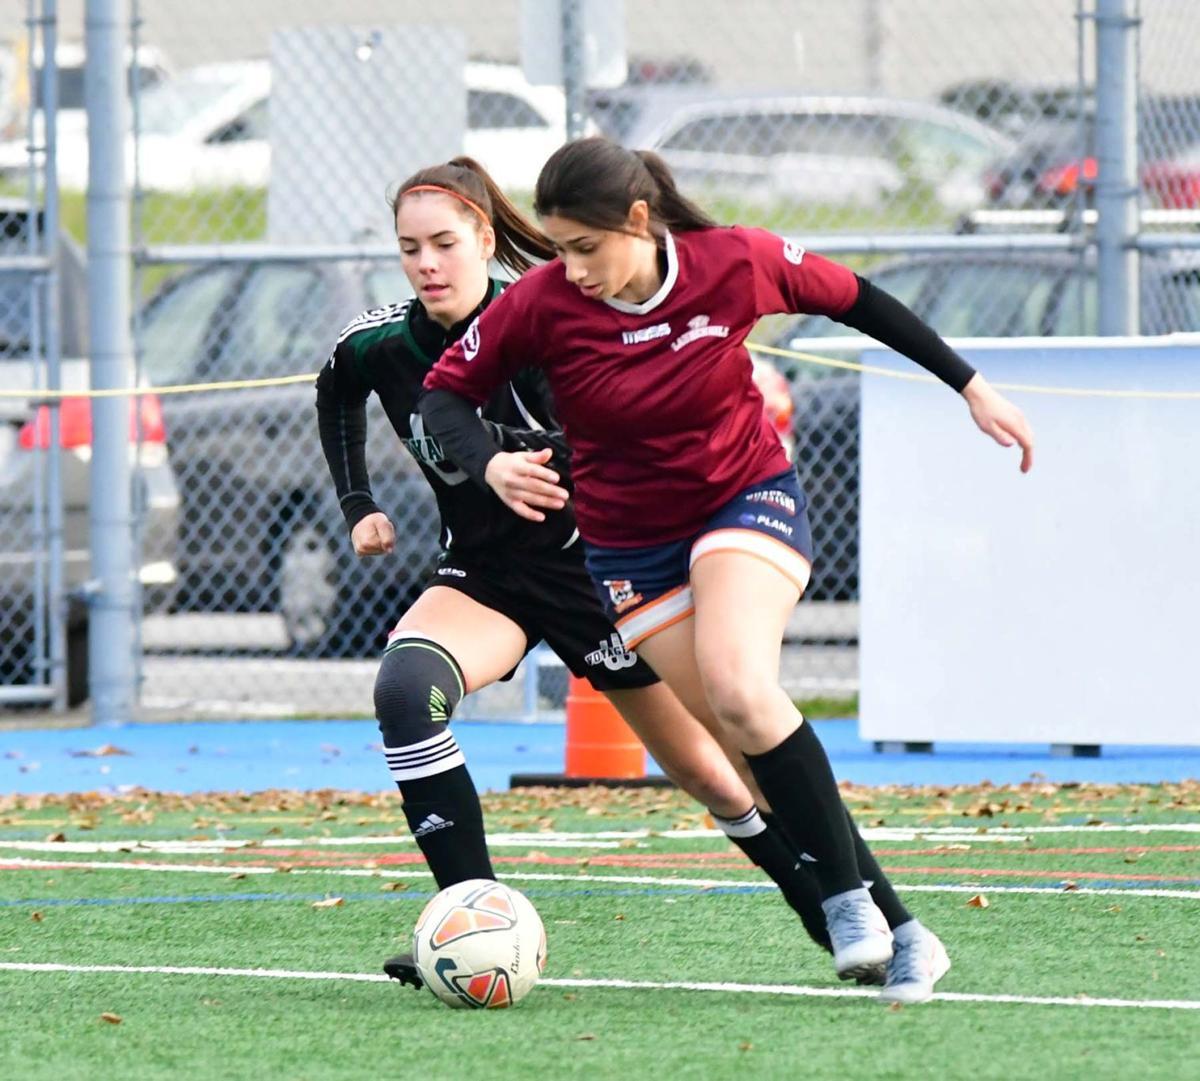 LaurenHill Lynx earn GMAA soccer championship